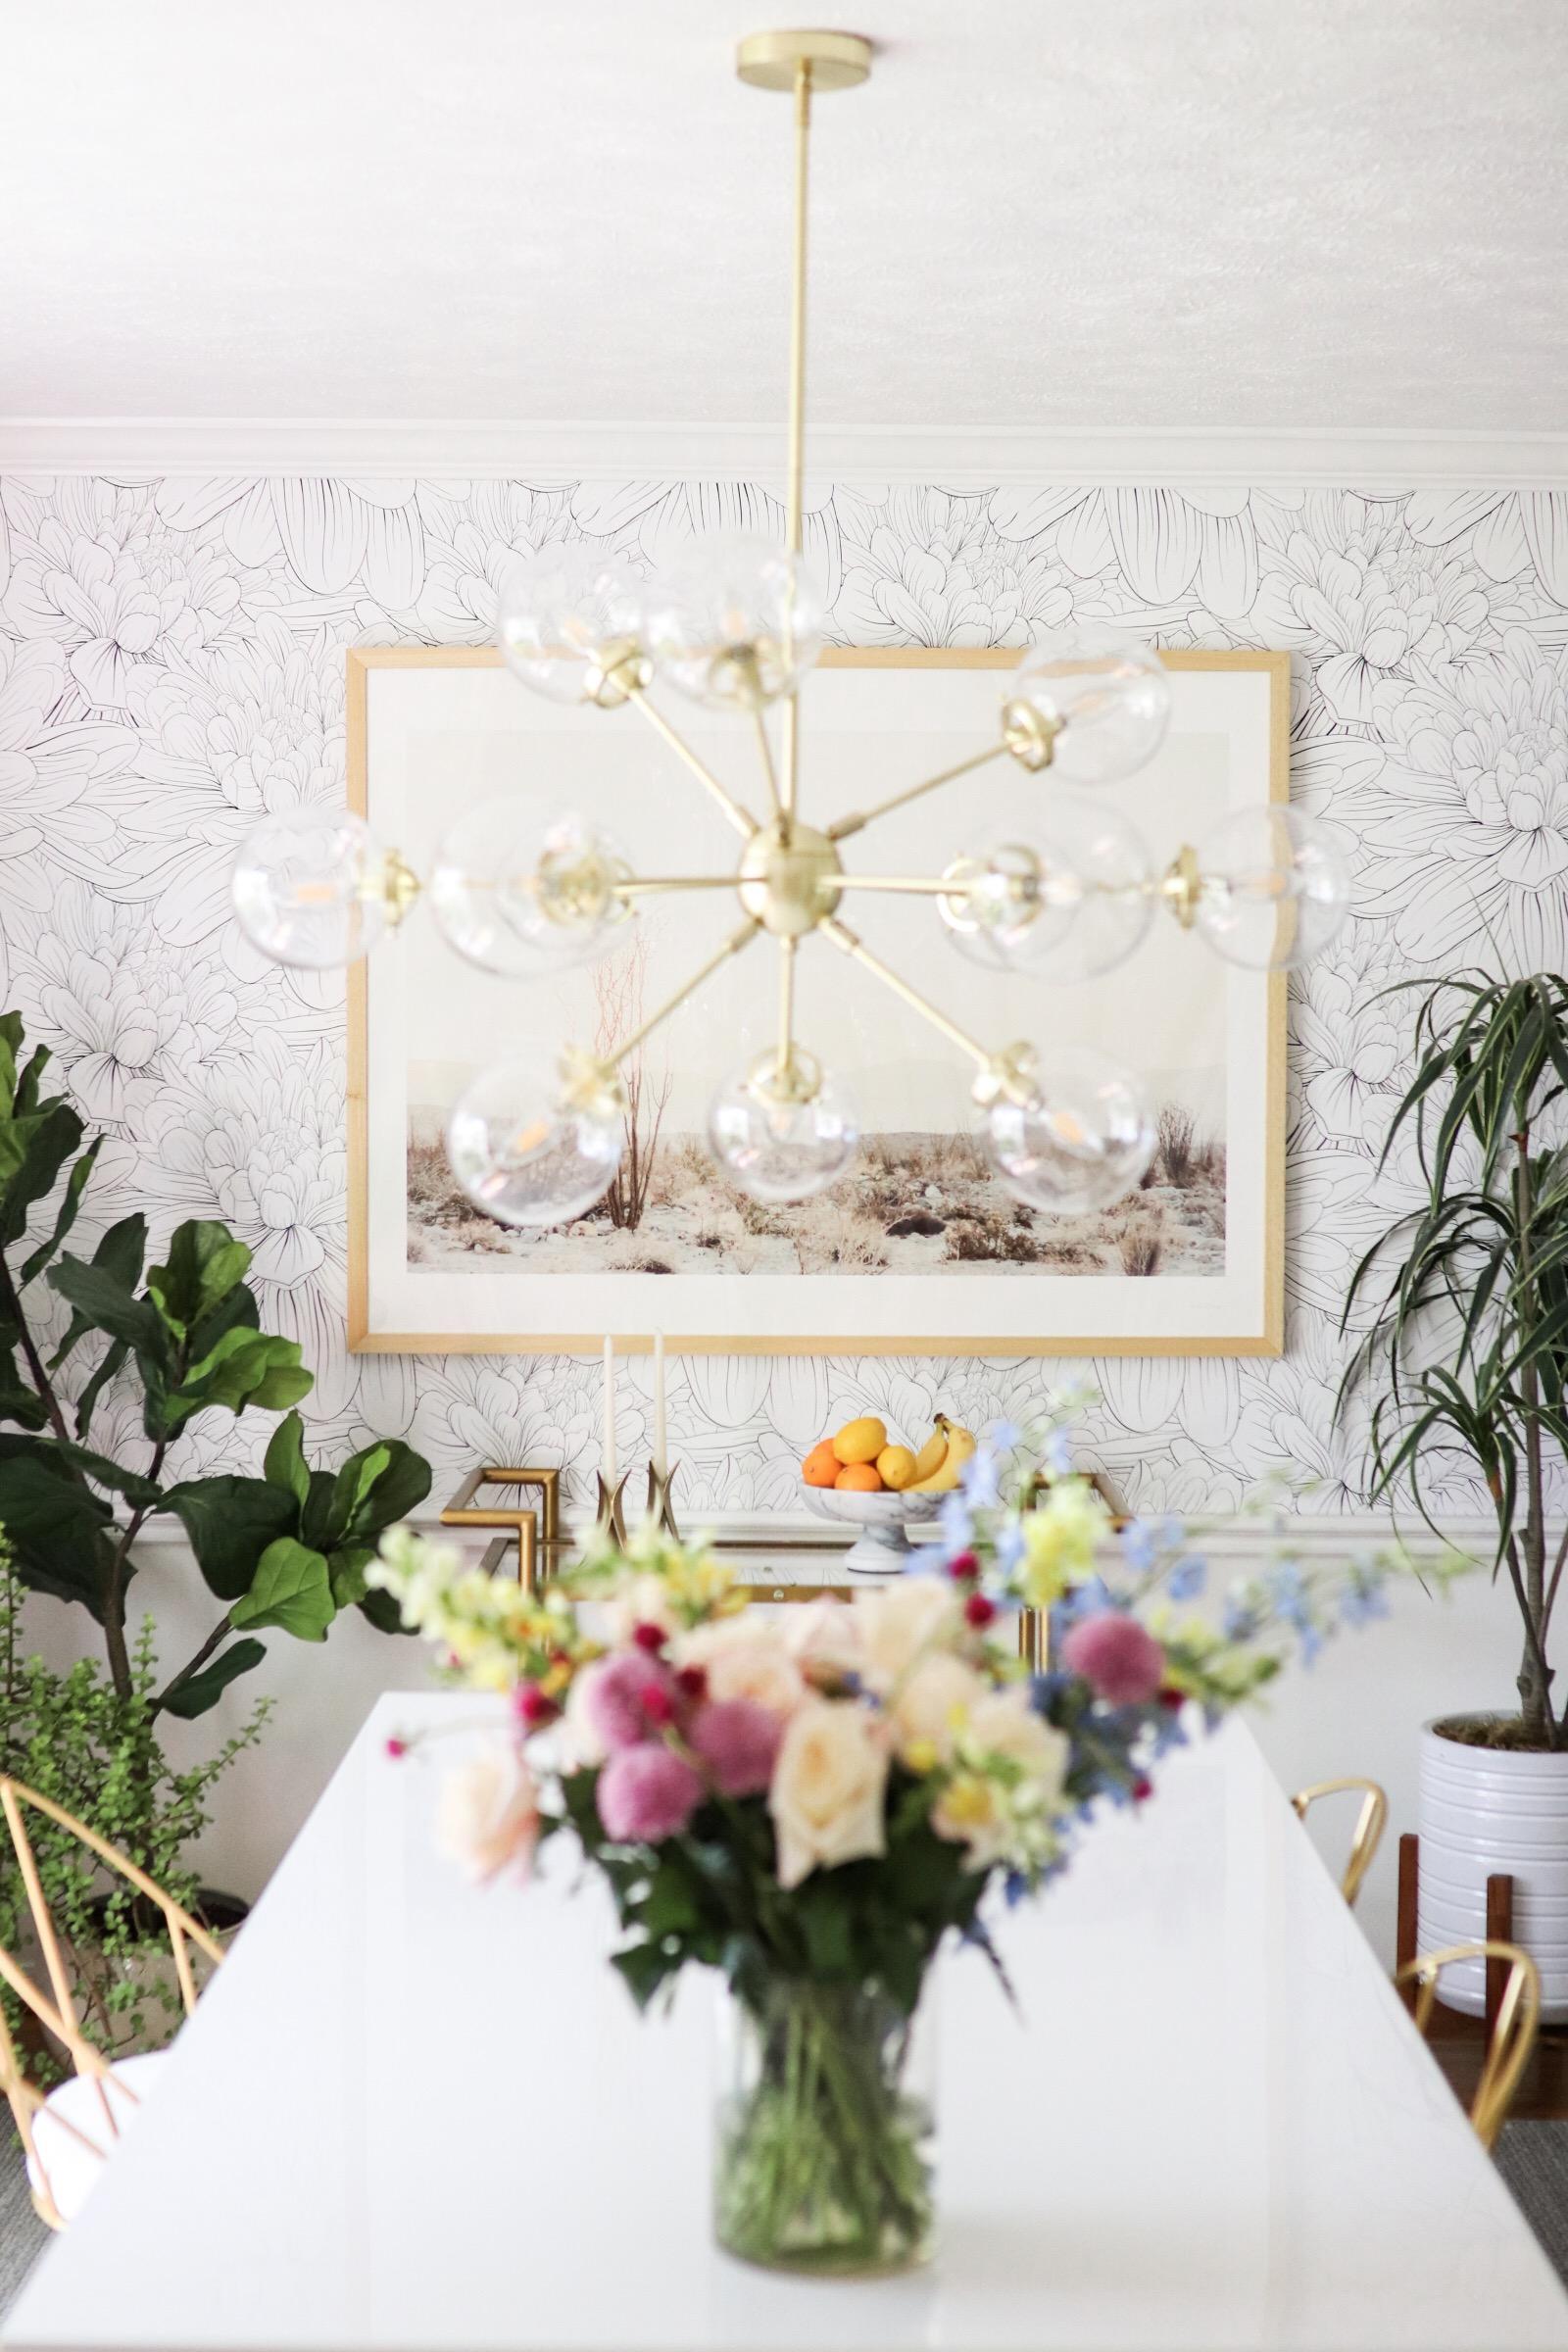 Home decor blogger Joyfullygreen wallpaper dining room makeover how to choose art with minted -02.jpg